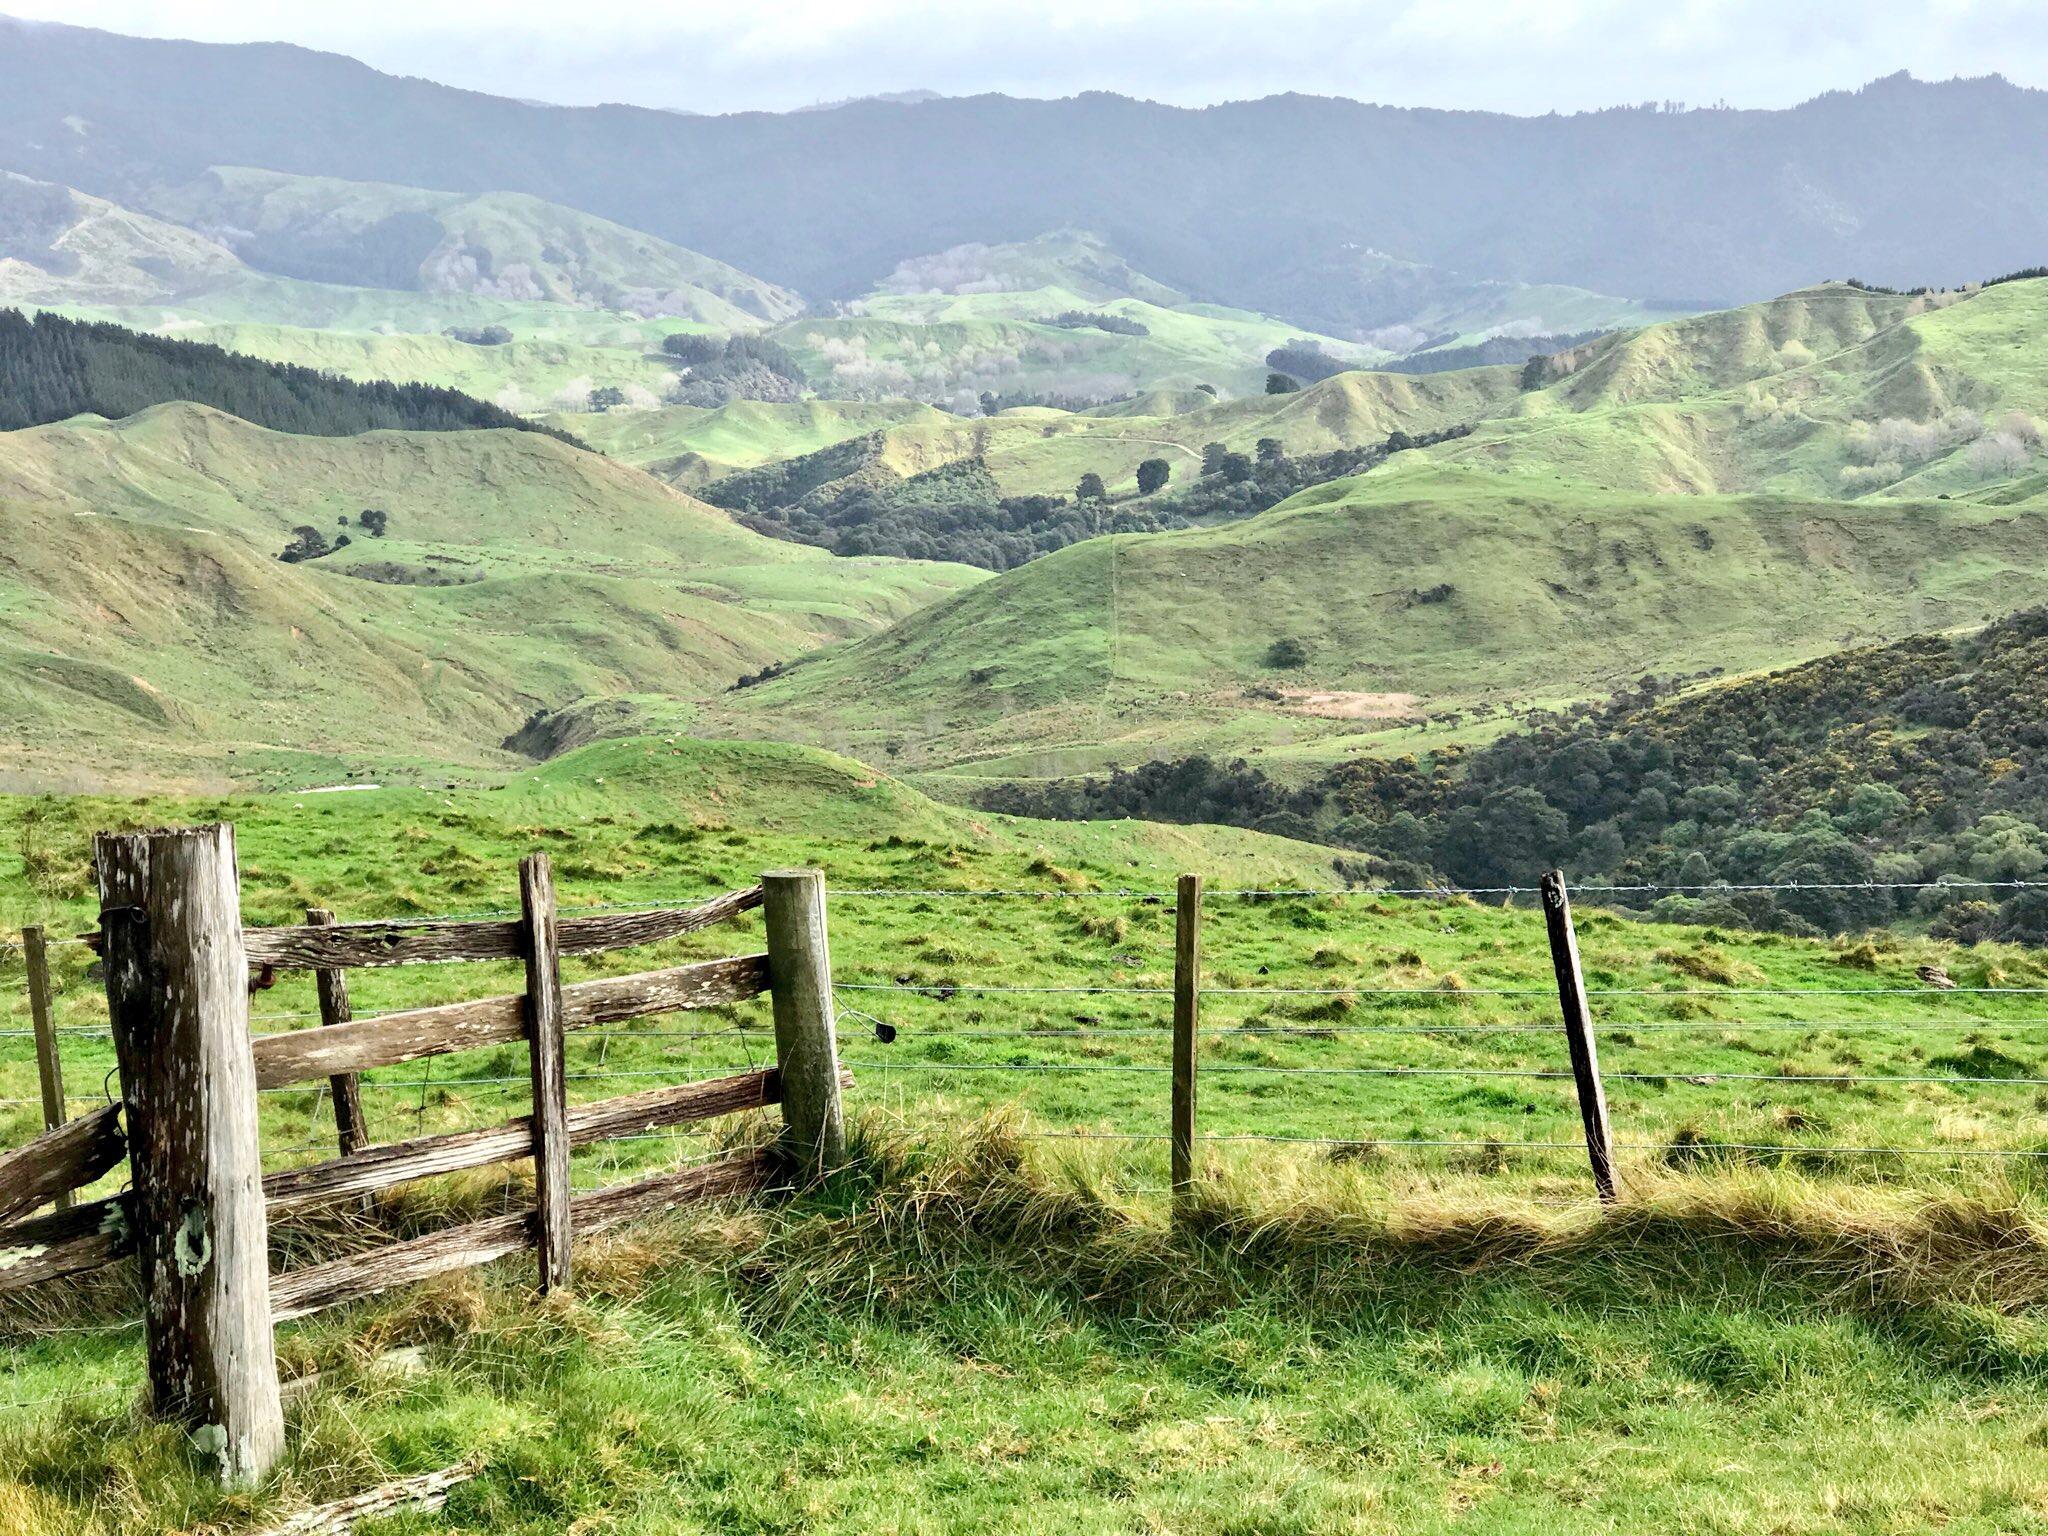 Farmland, Wairarapa (image by Jacqui Gibson).